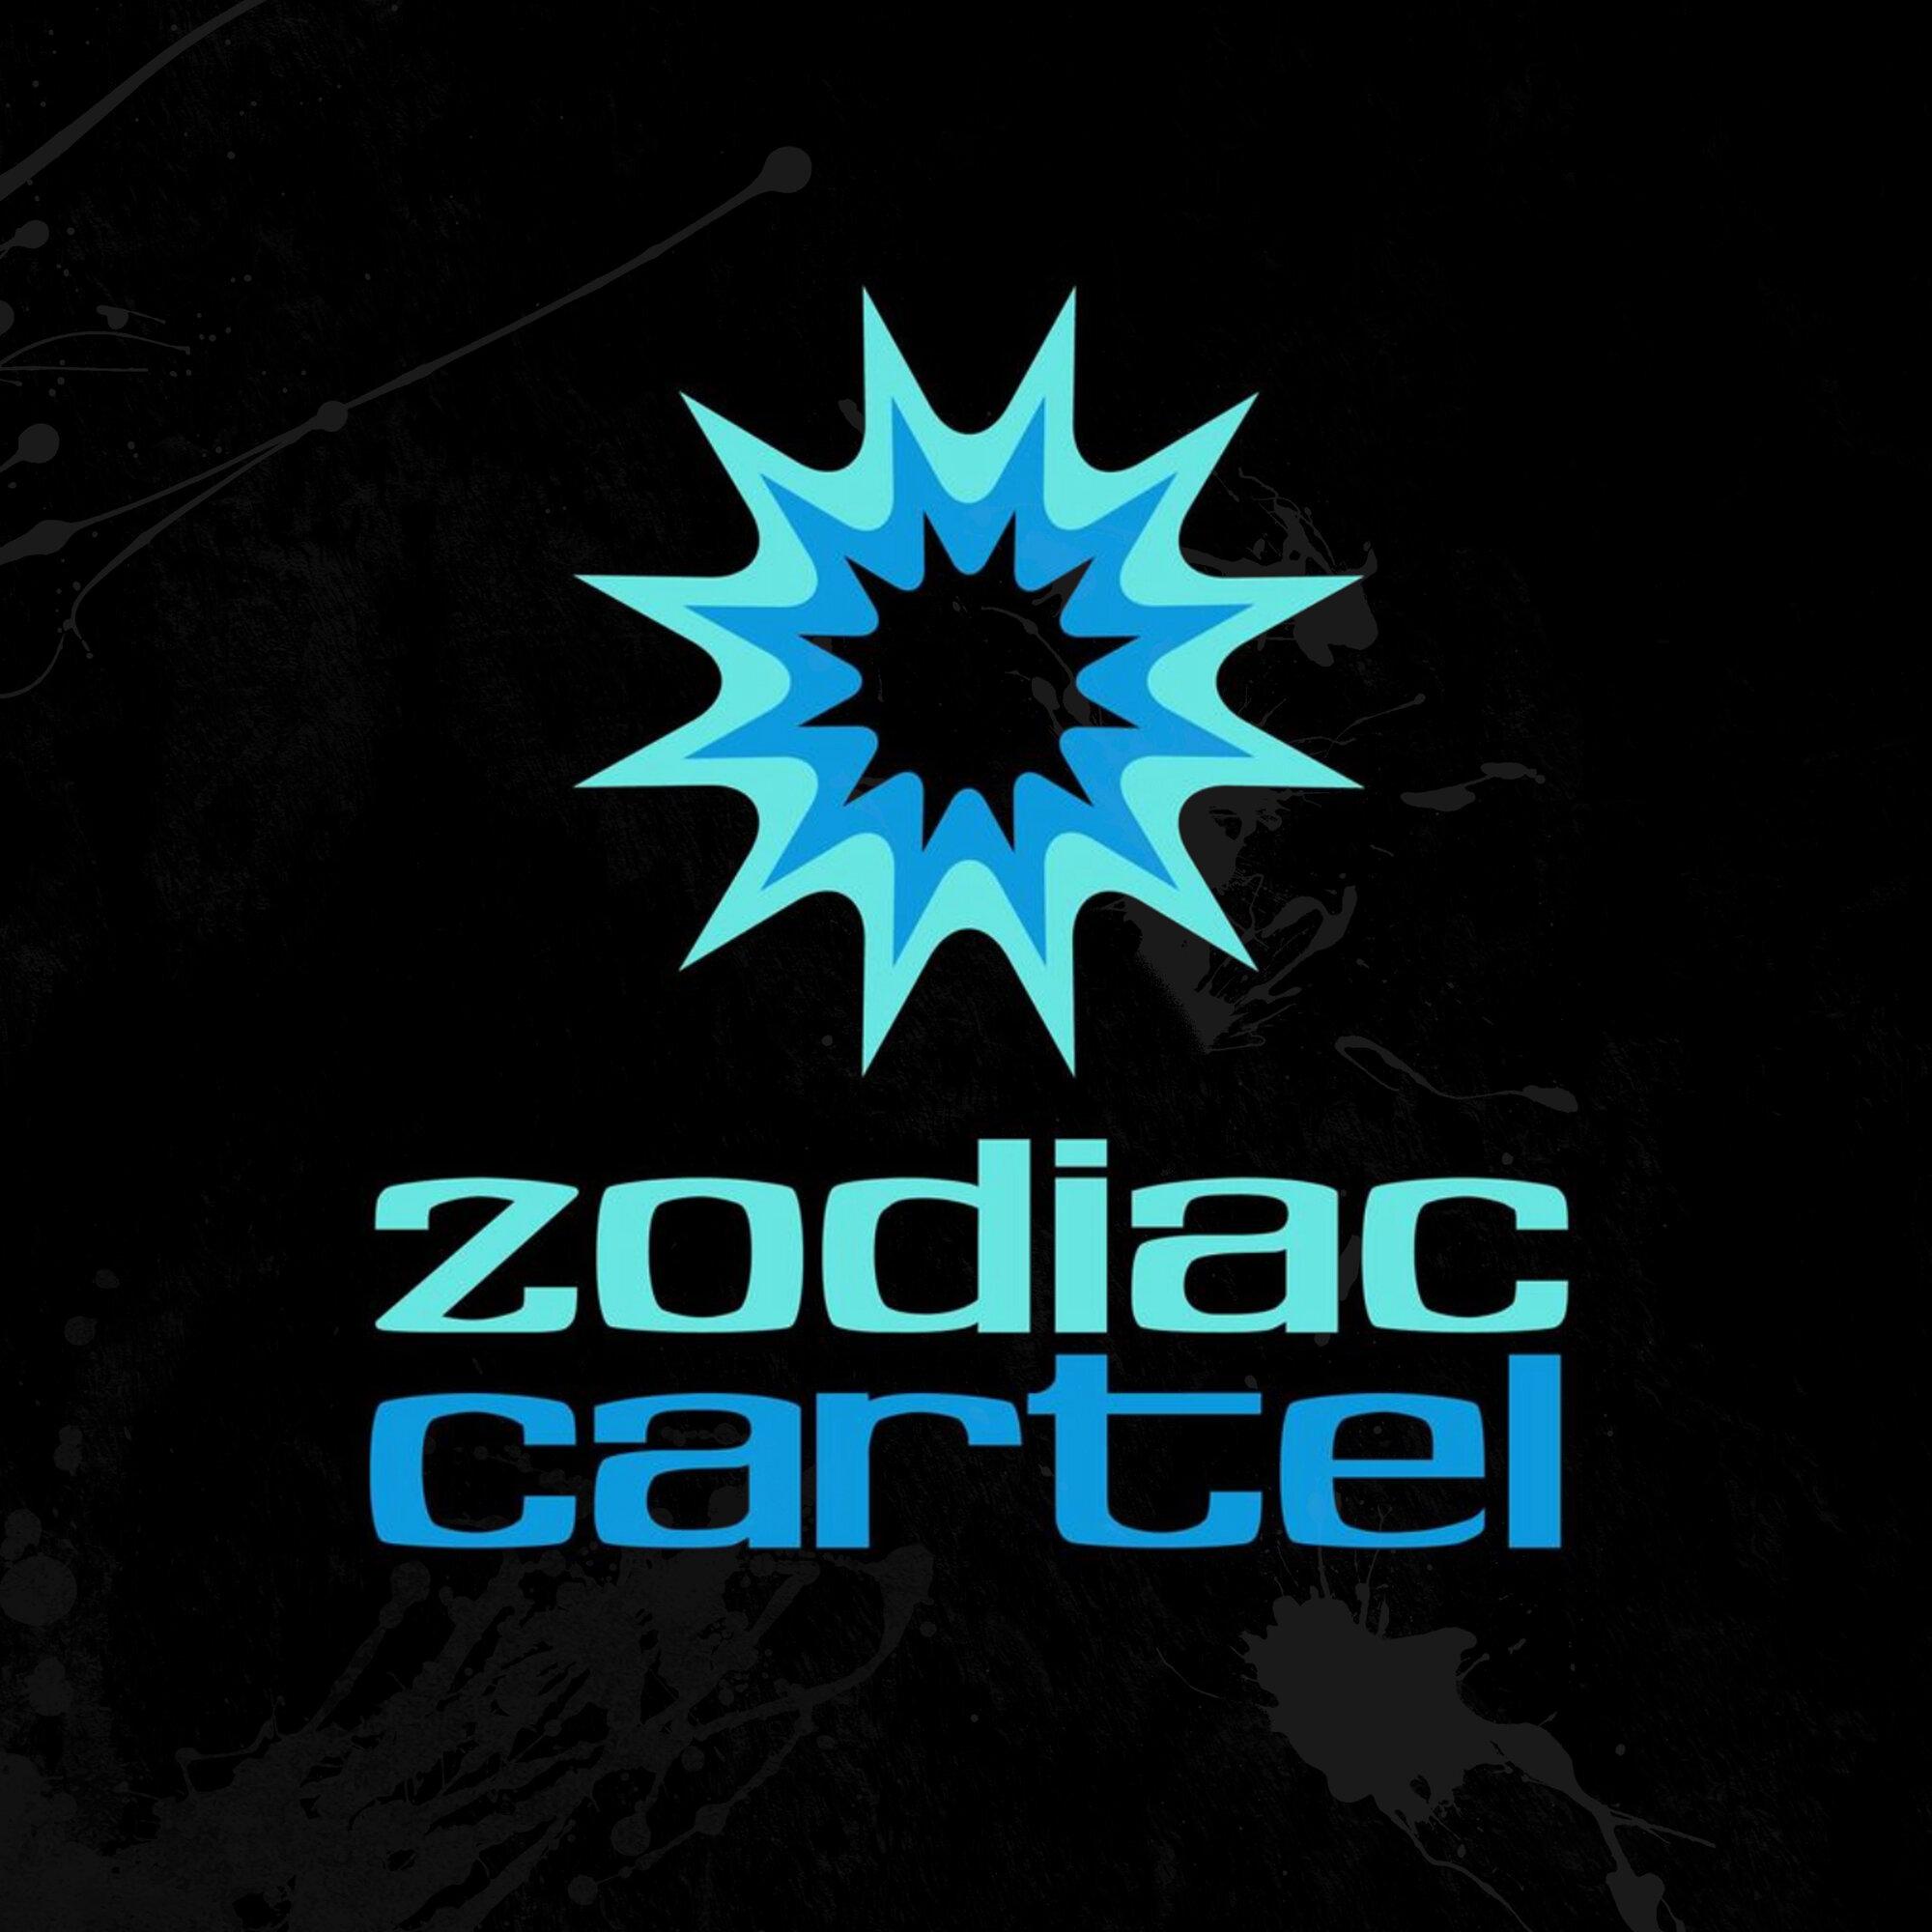 Zodiac-Cartel-Logo.jpg